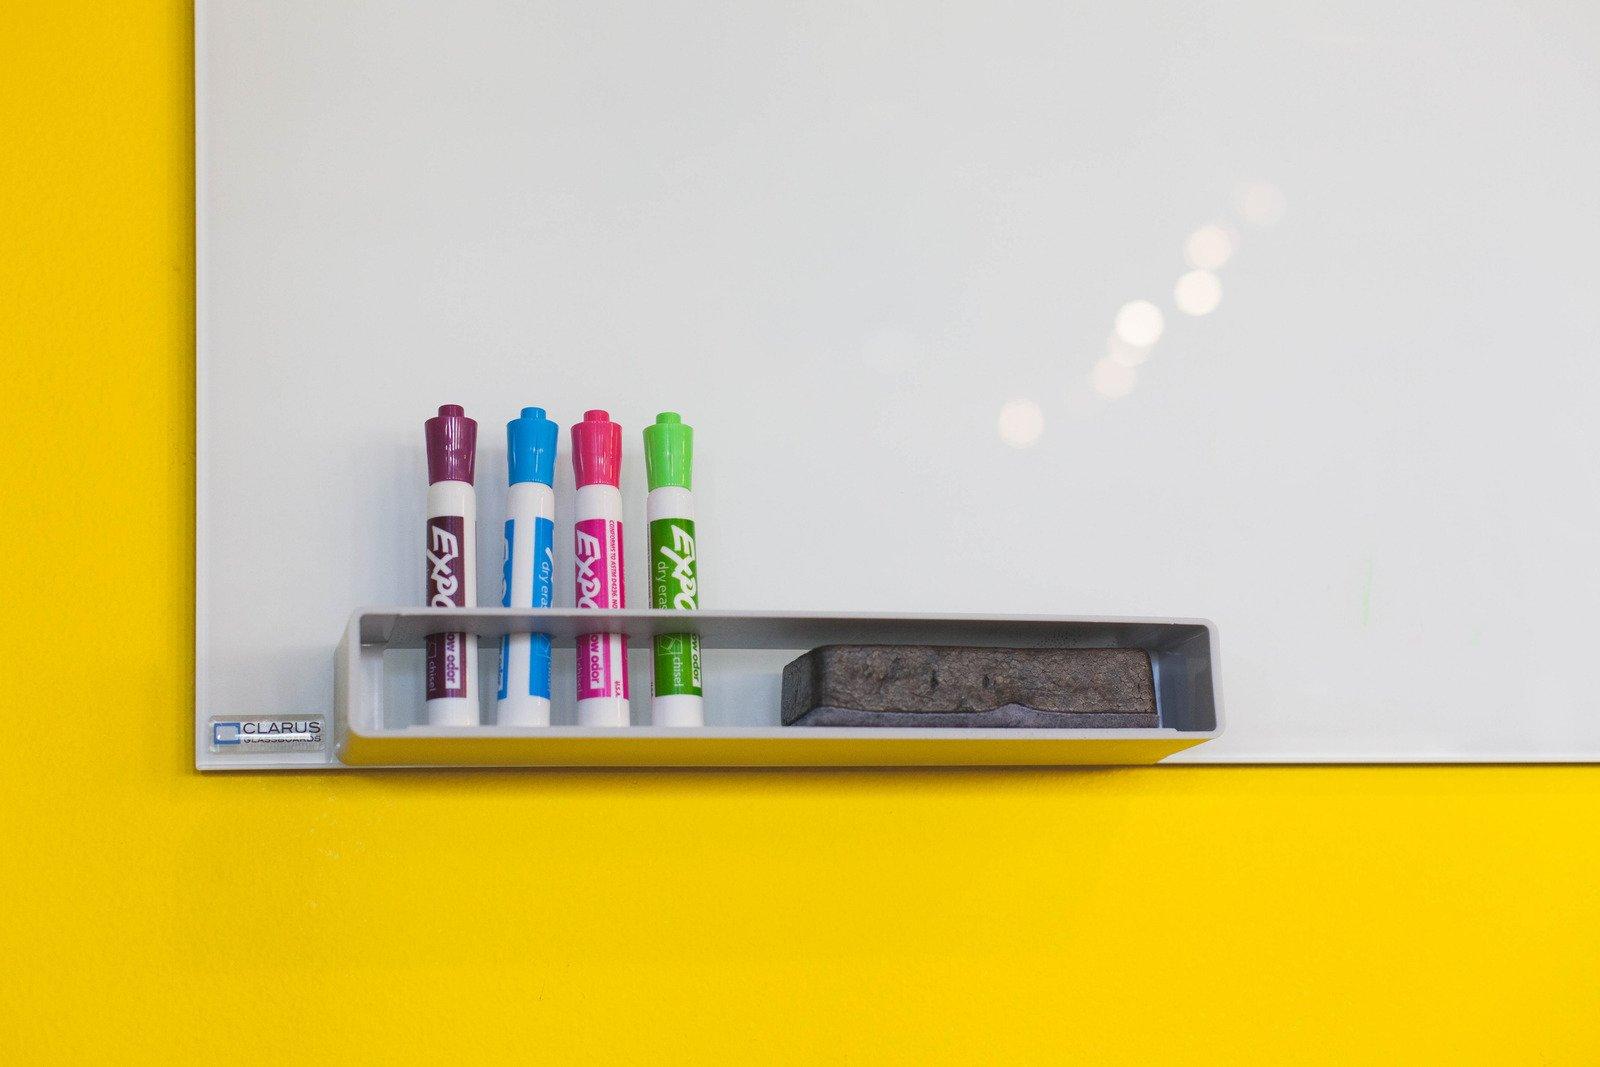 Four Assorted Color Glue Stick Bottles